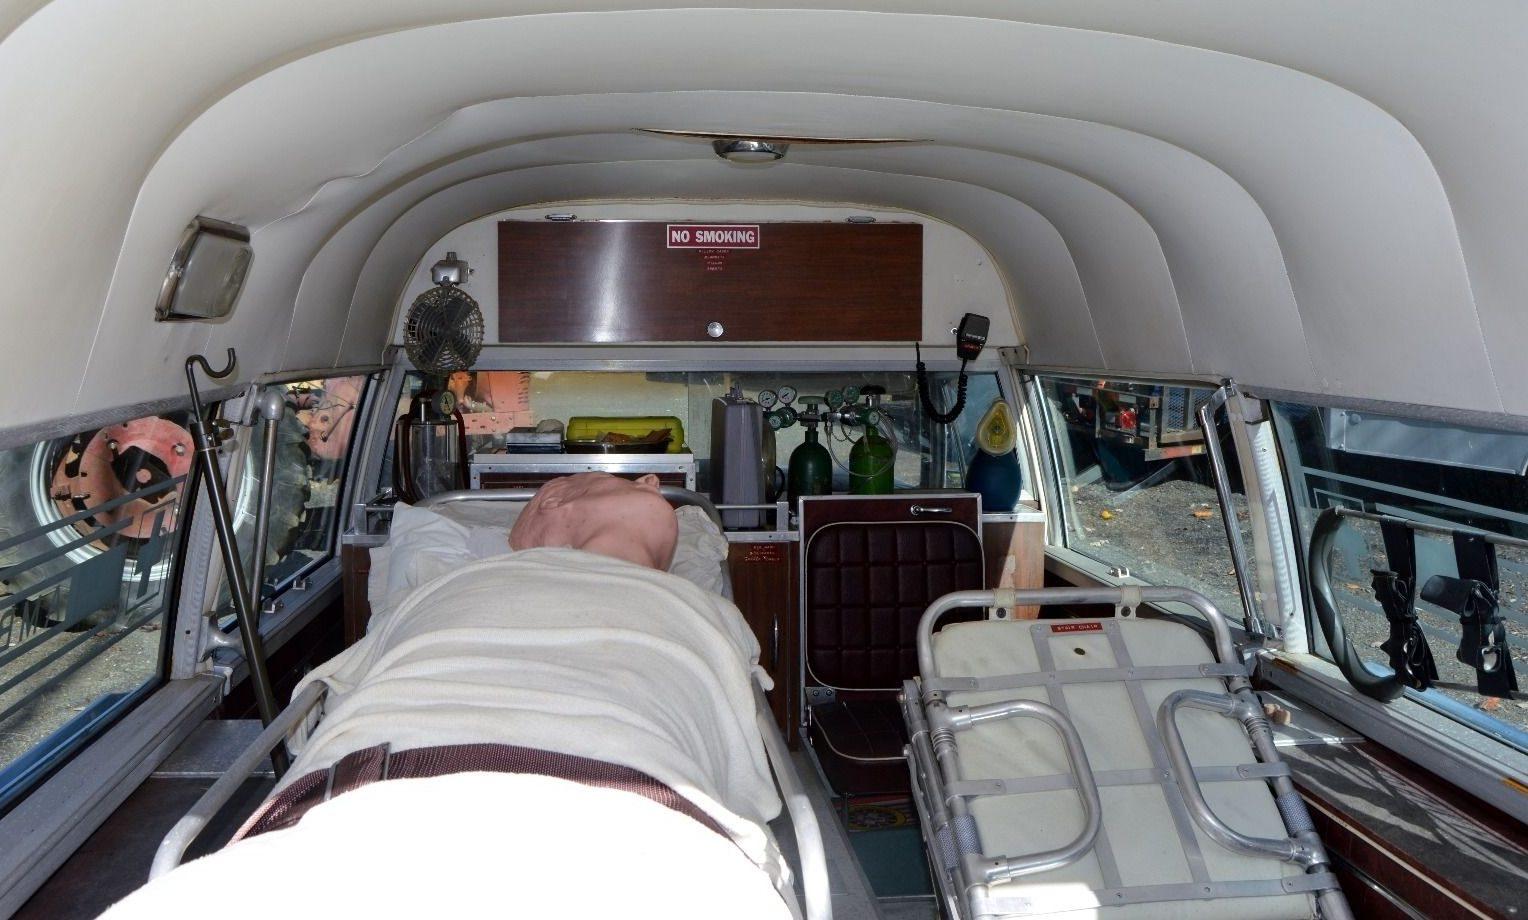 Ambulance For Sale >> A Bit Too Real: 1966 Cadillac Ambulance